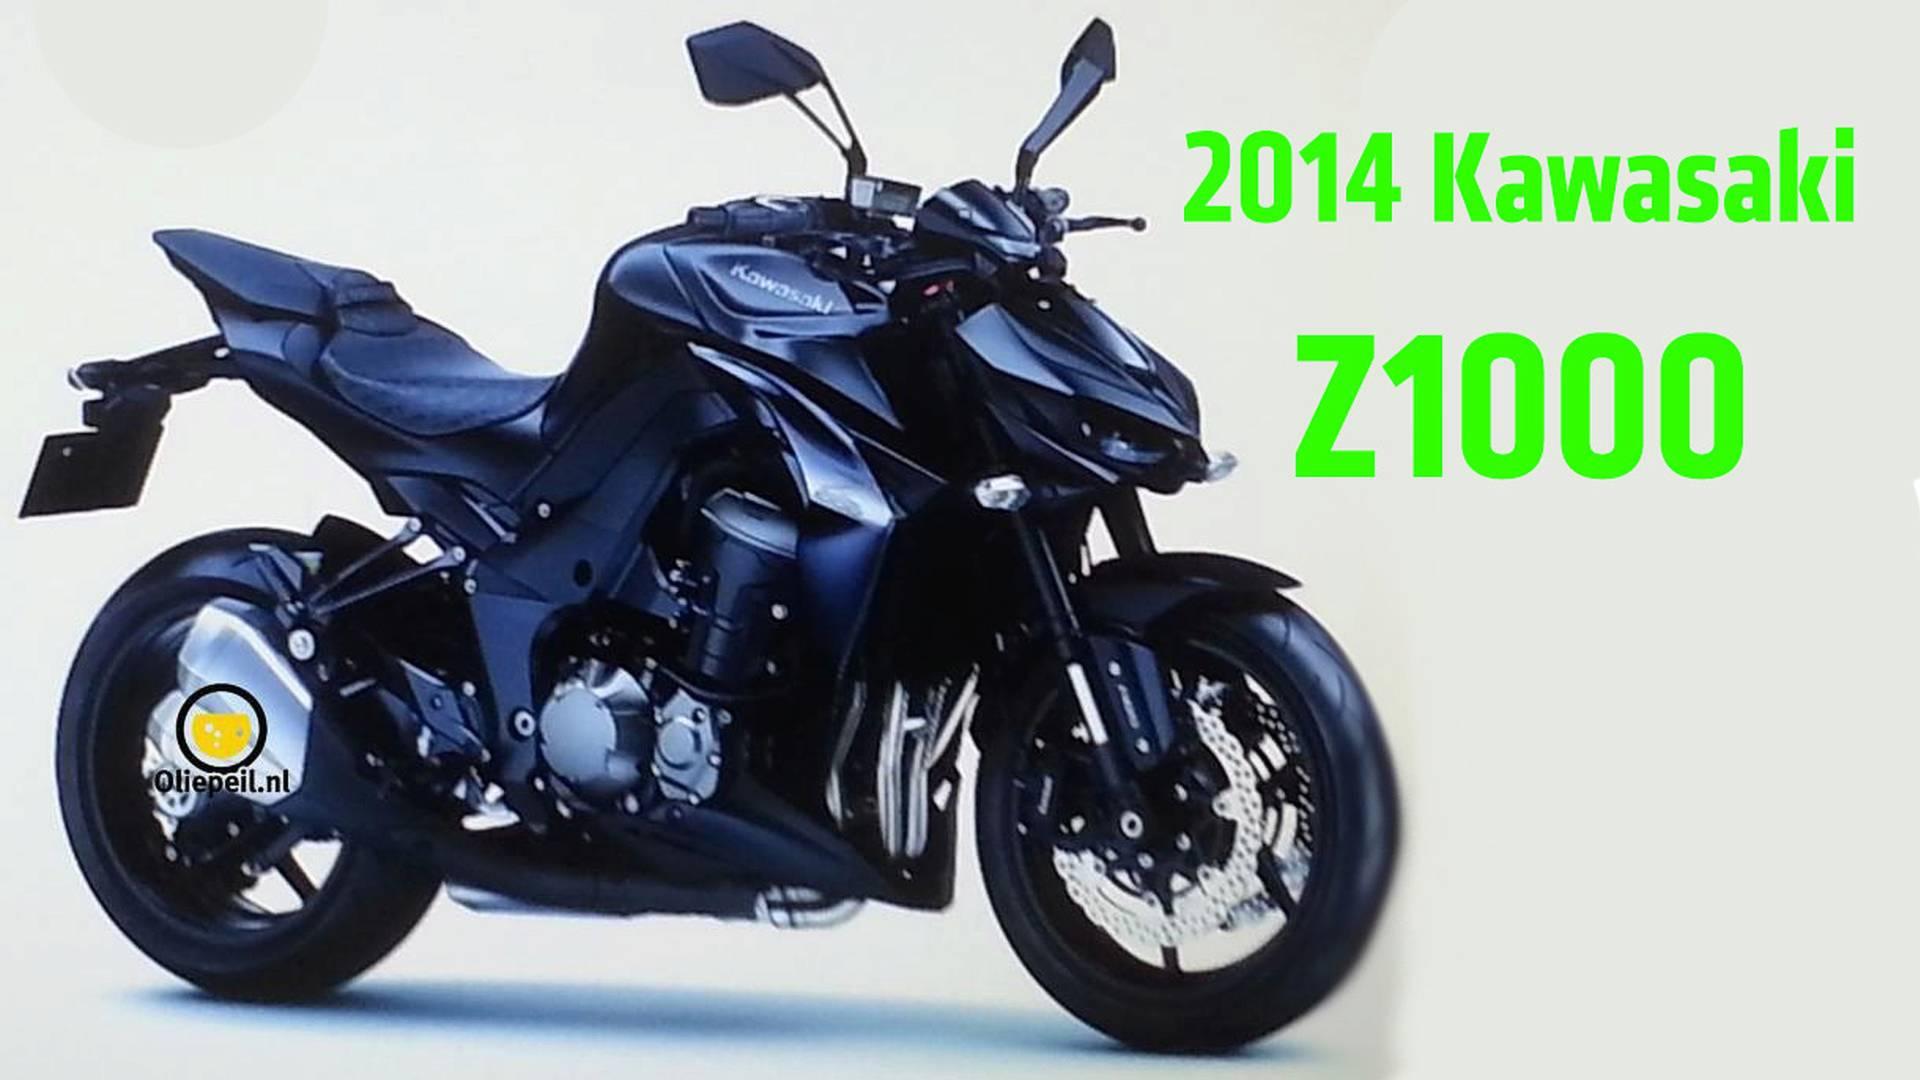 2010 Kawasaki Z1000 first ride: Japans best super-naked